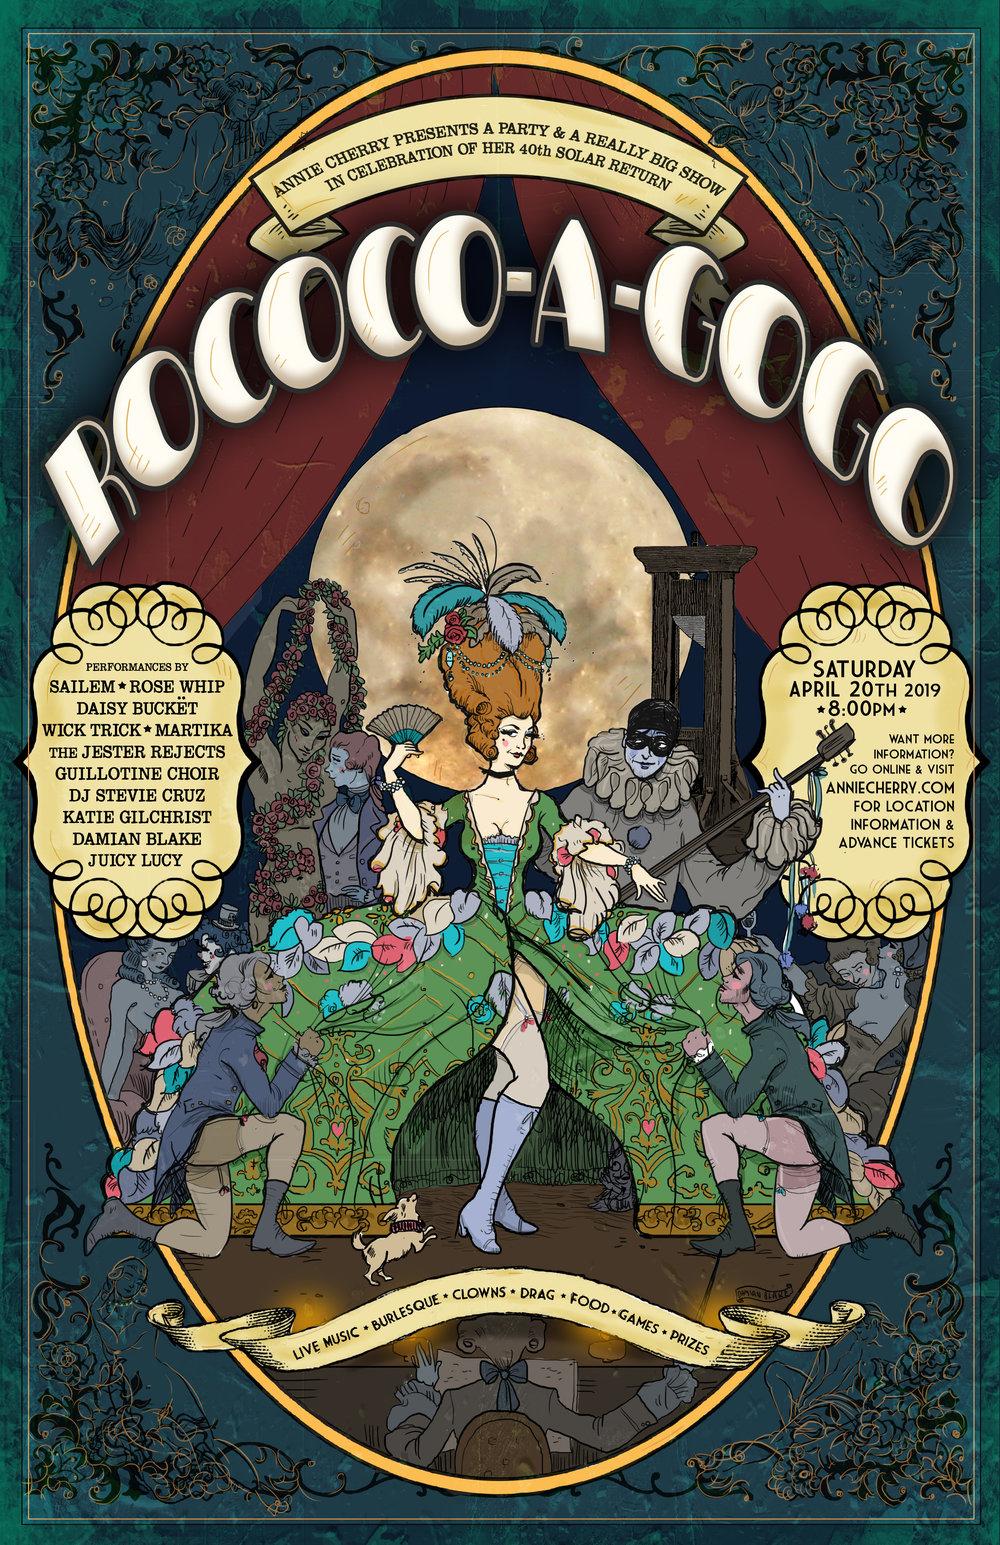 rococo-poster.jpg